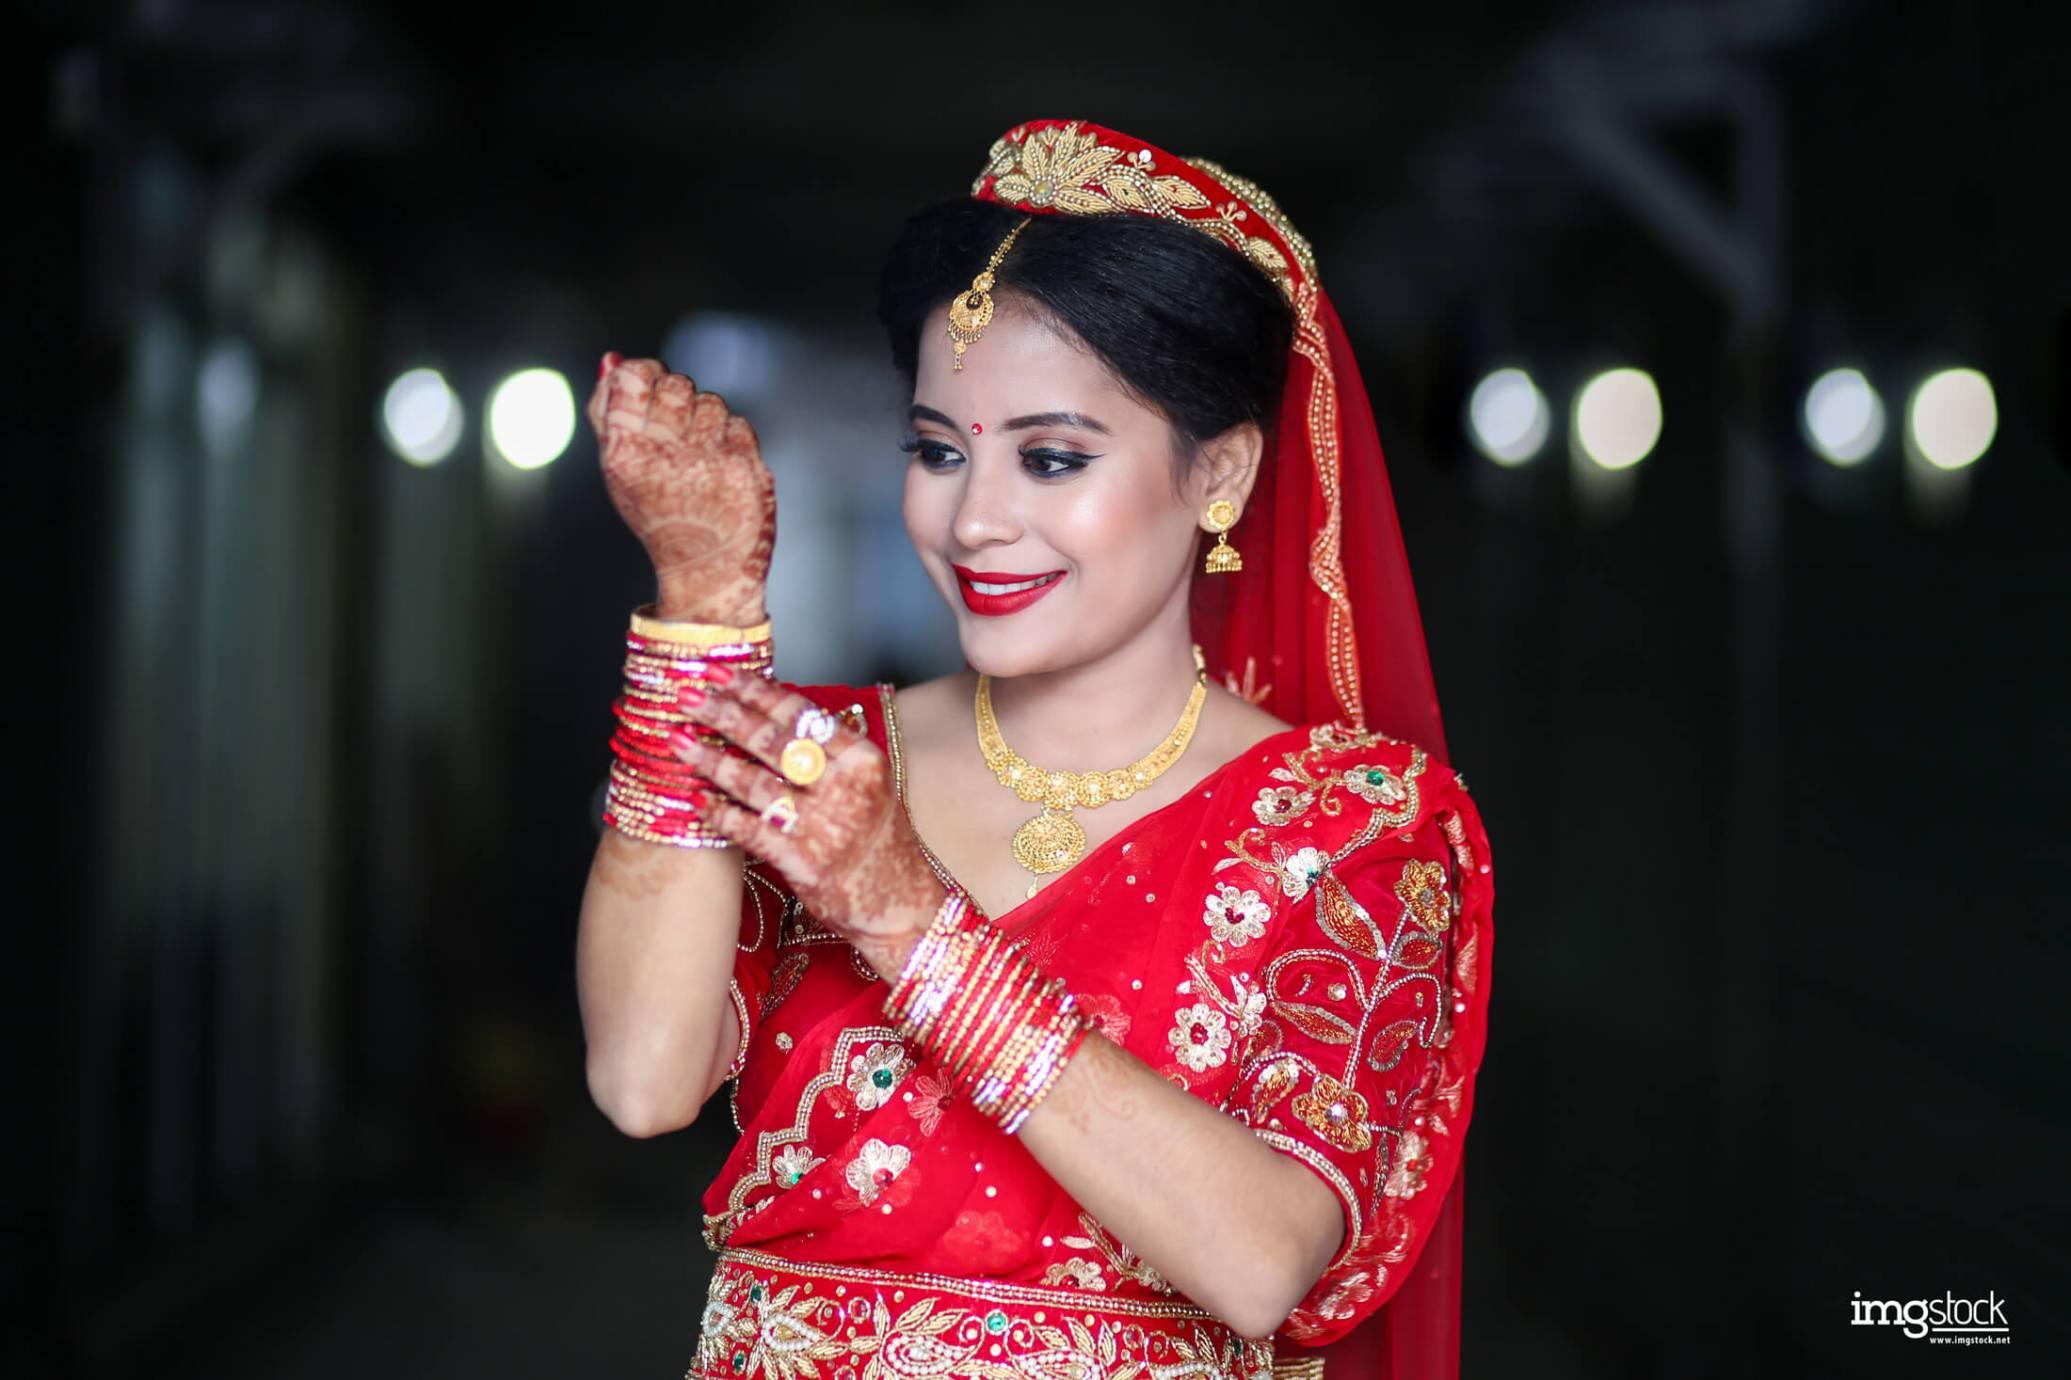 Priyanka Koirala